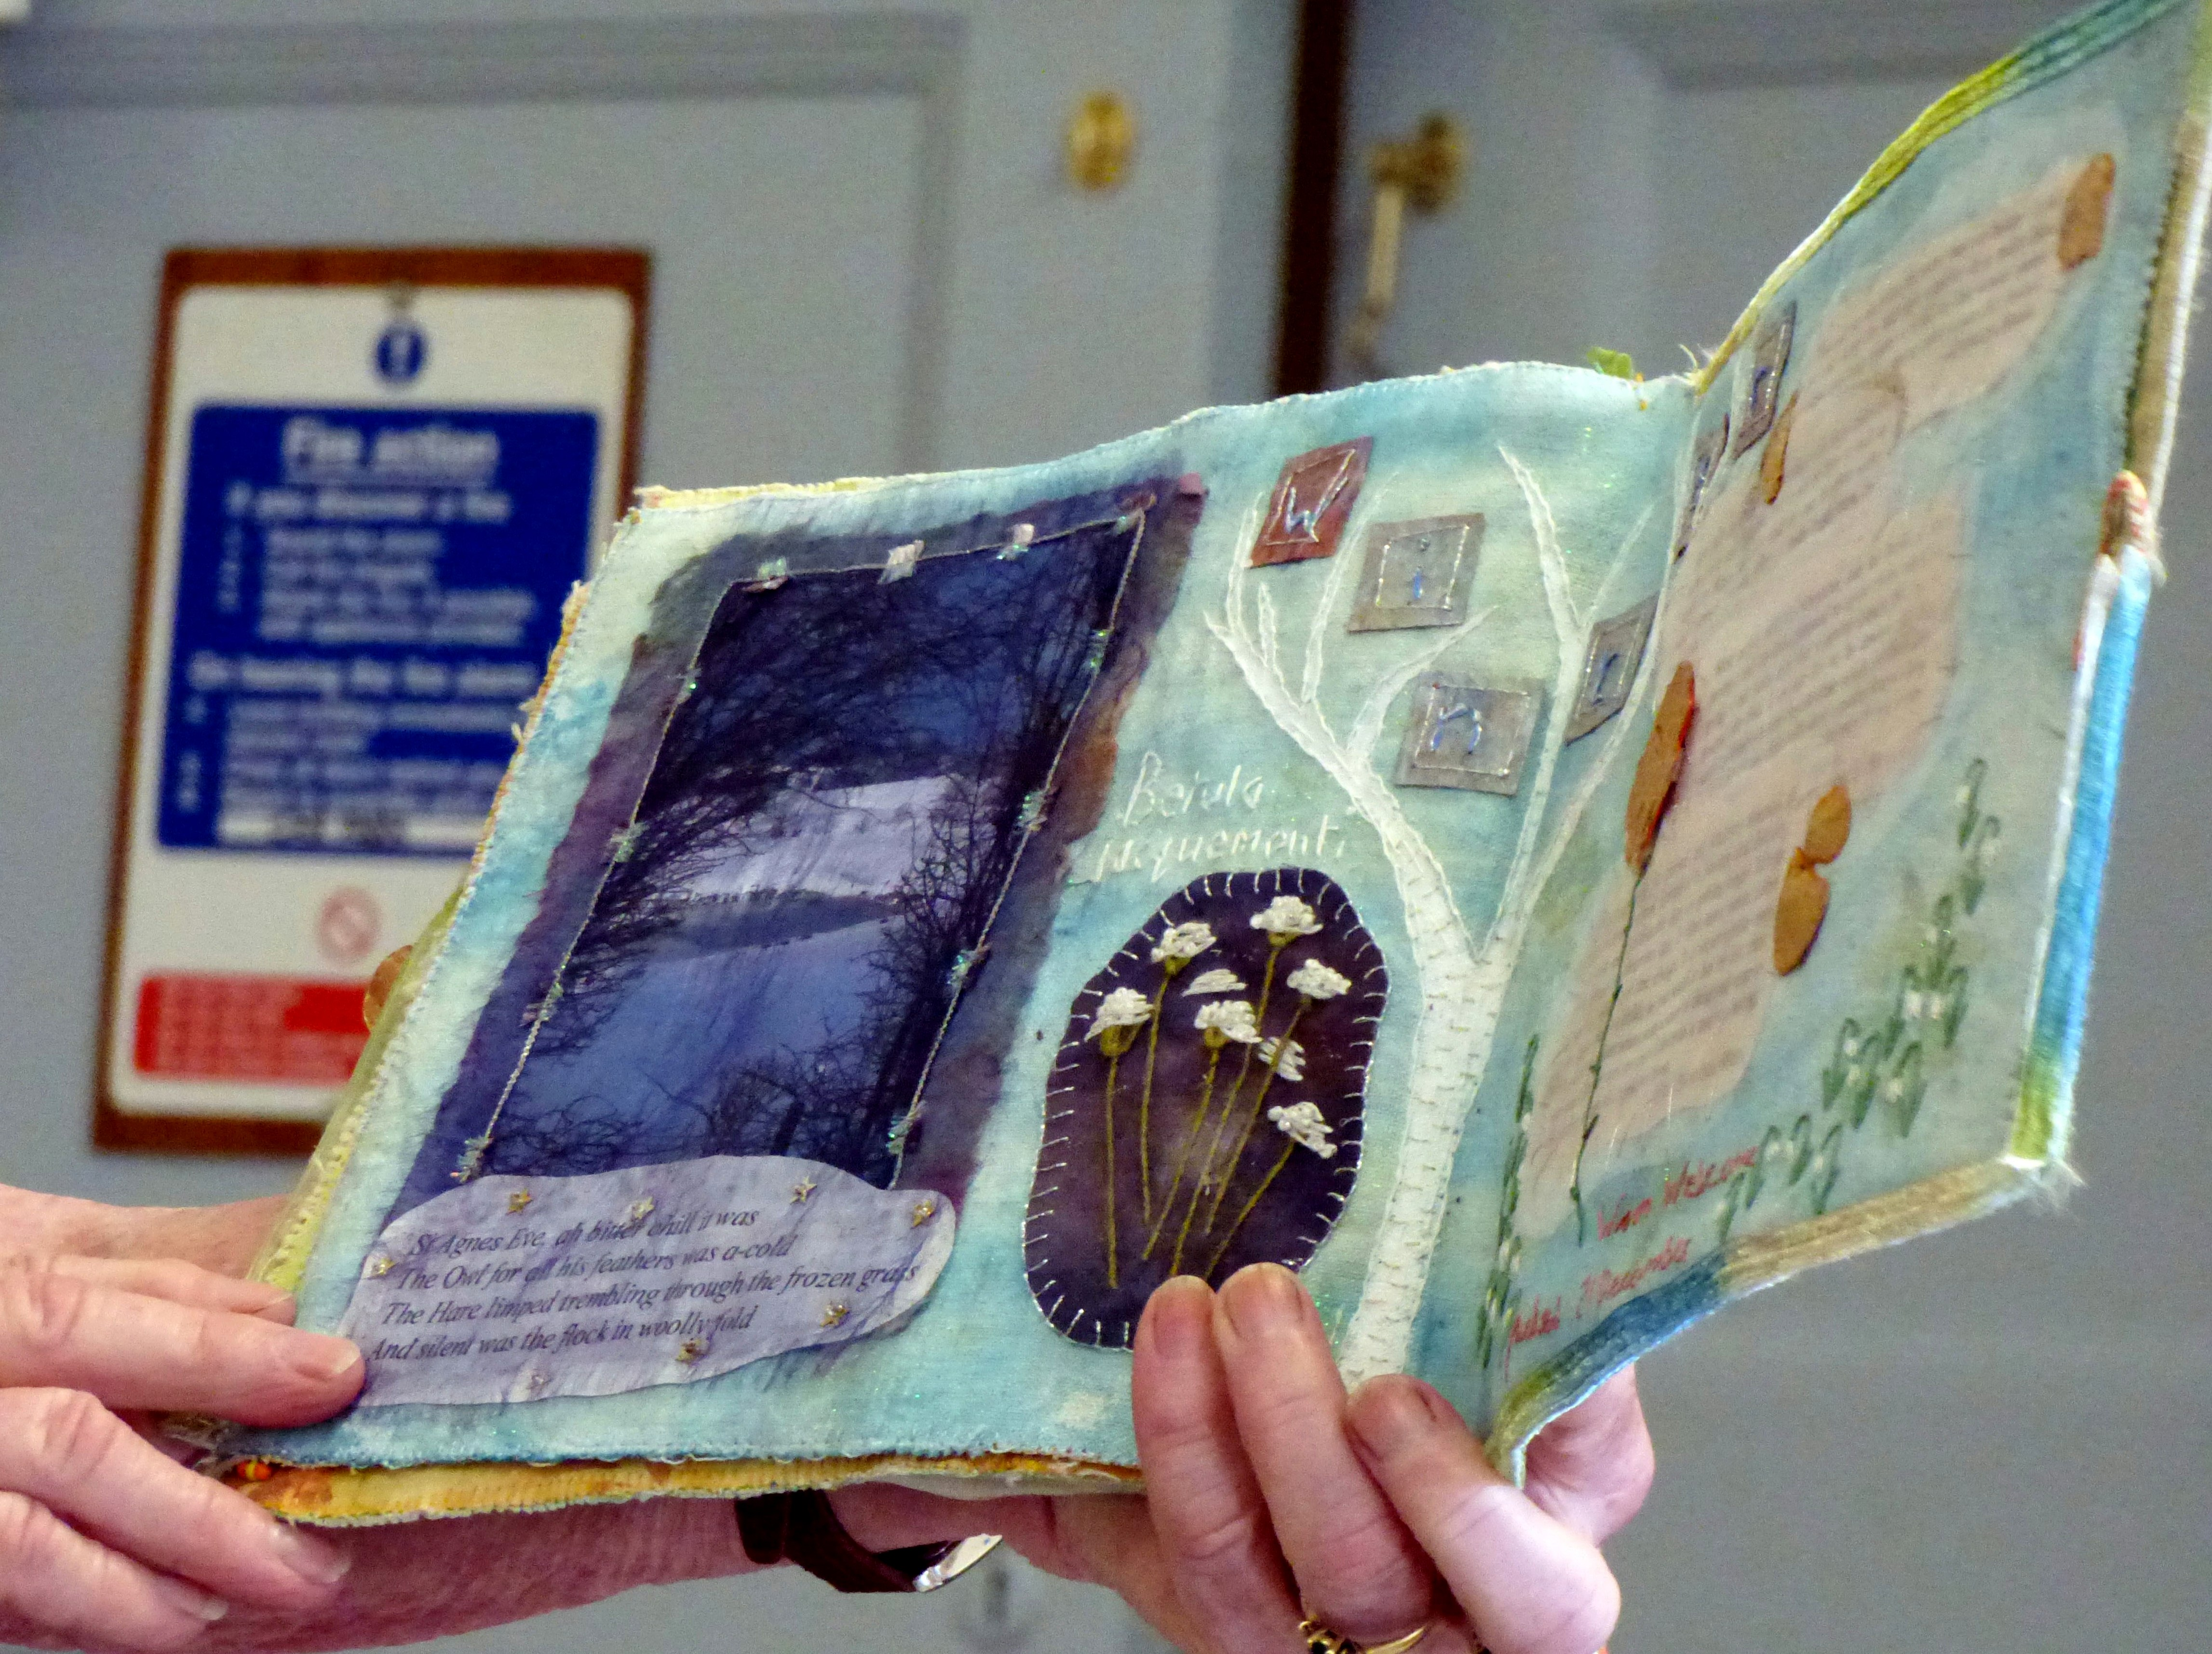 GARDENS textile journal by Chris Harris